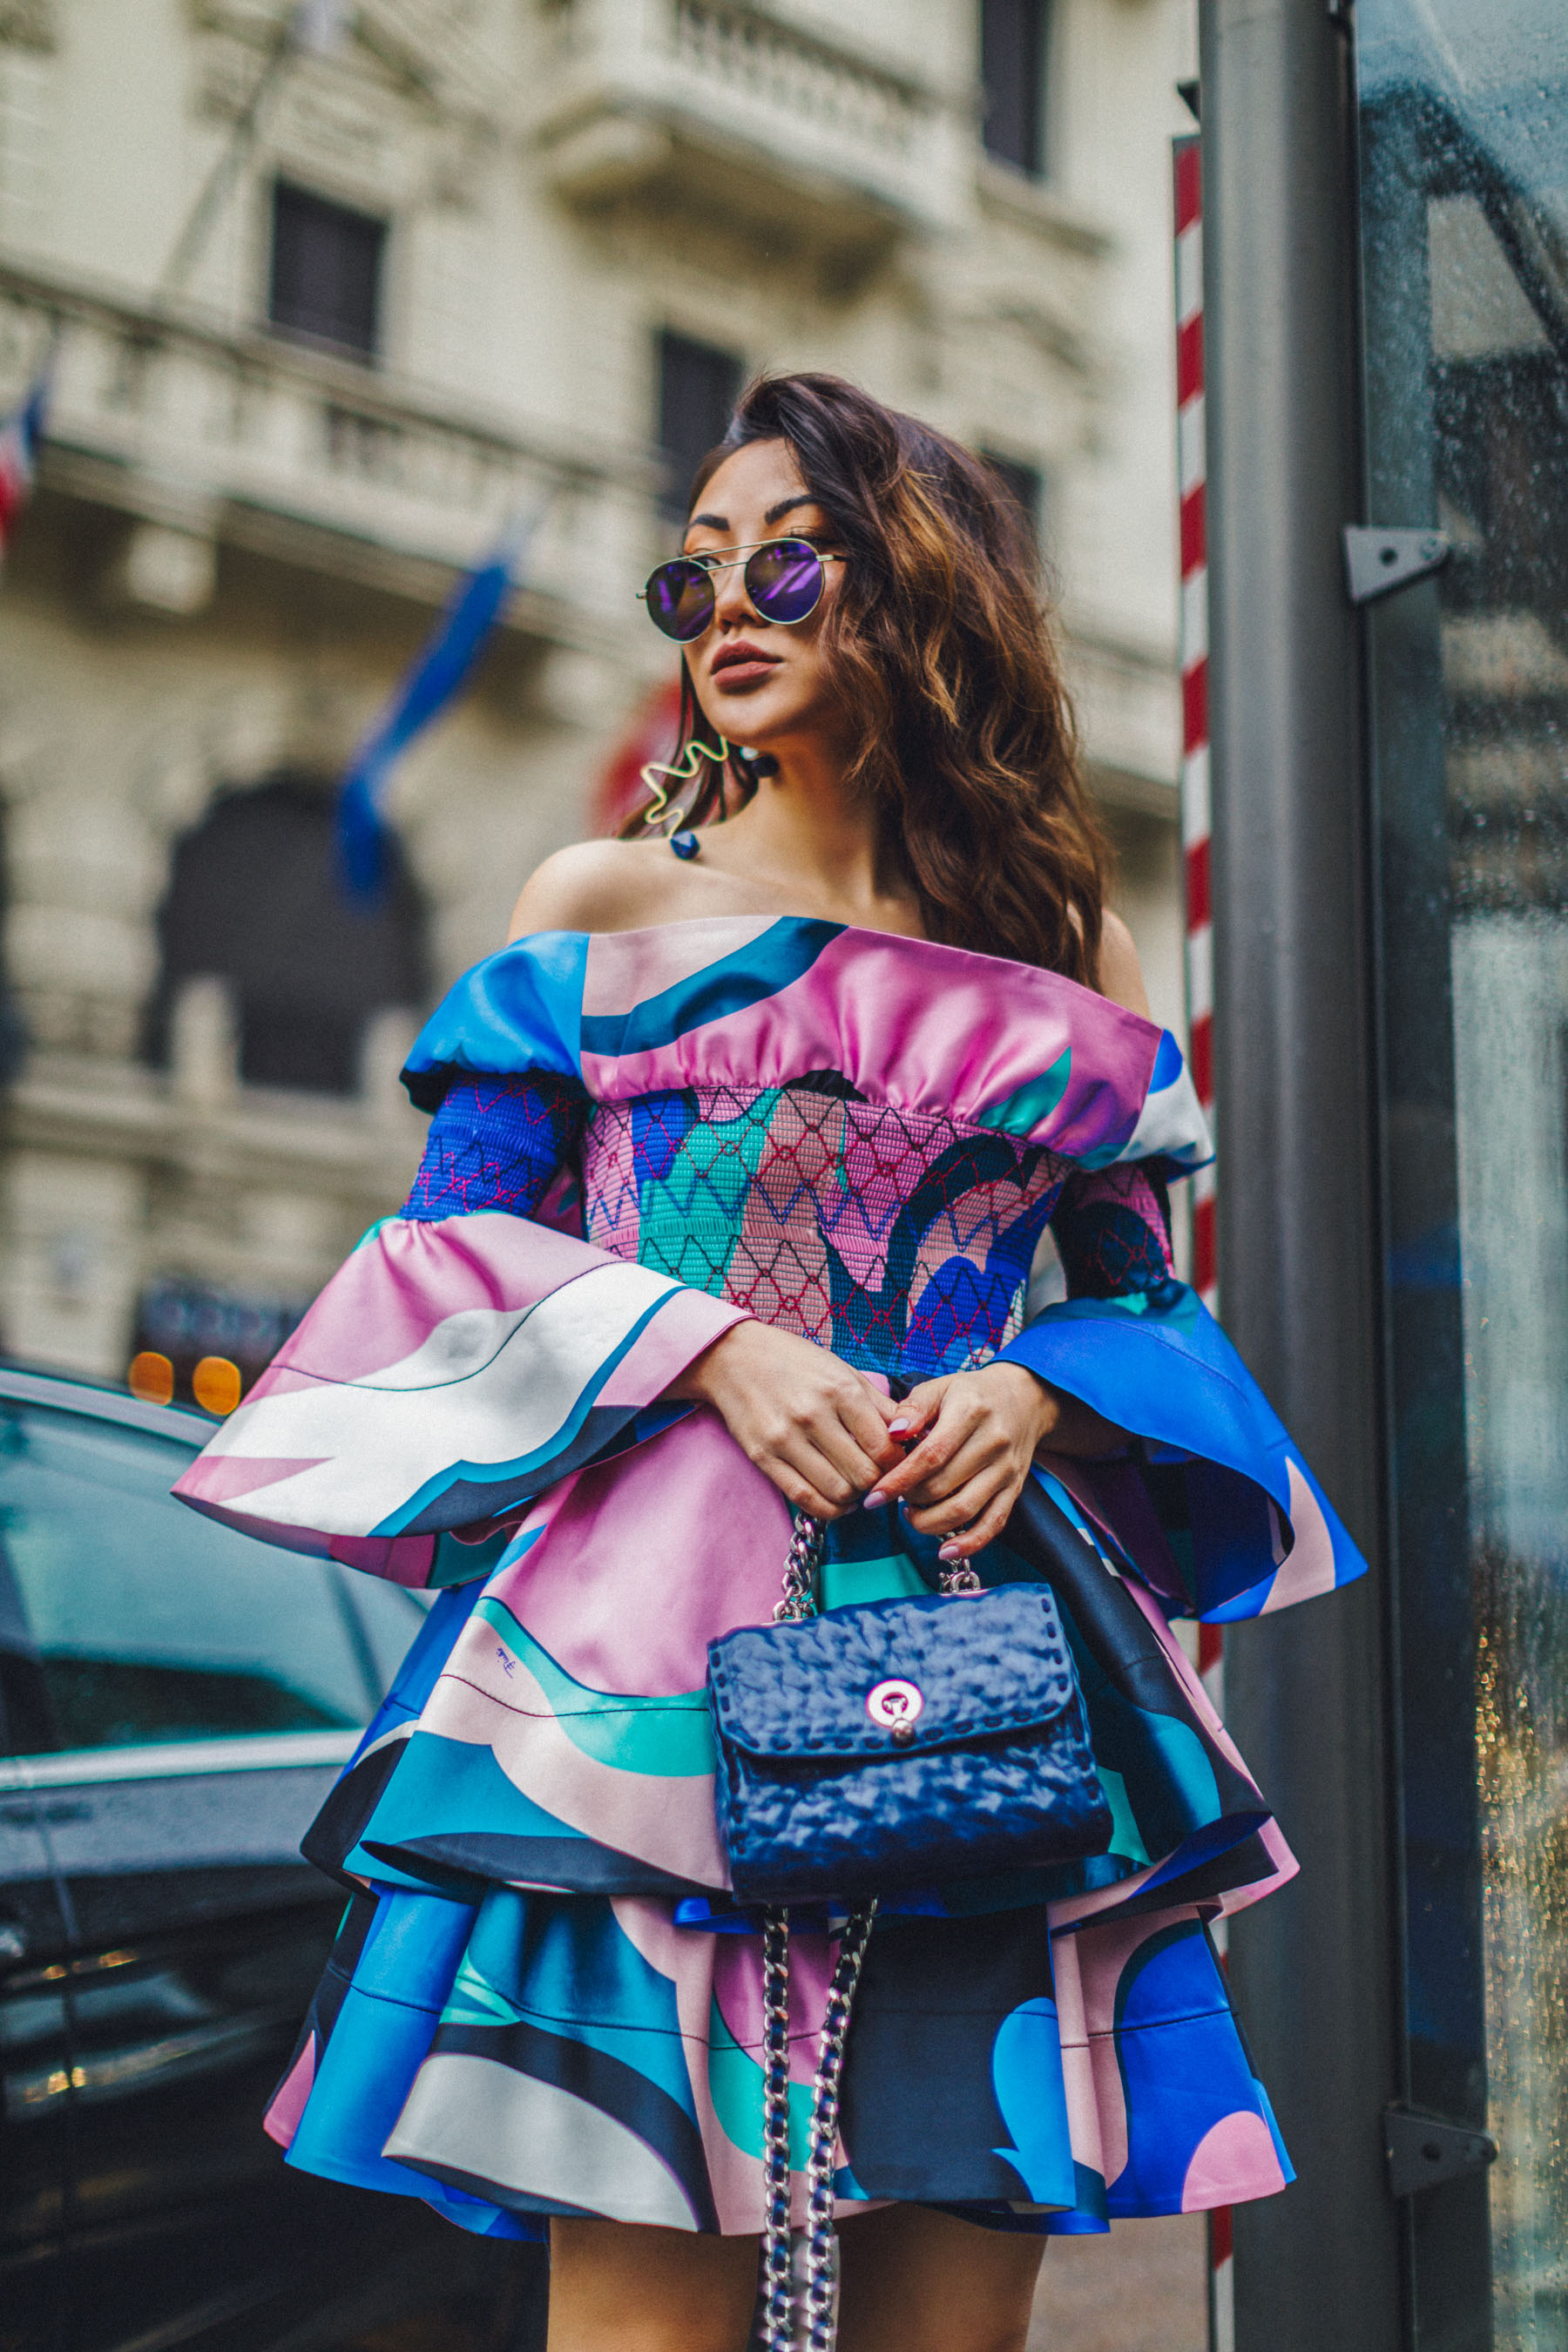 MFW Recap - Emilio Pucci Look, MFW Street Style, Emilio Pucci Dress // Notjessfashion.com